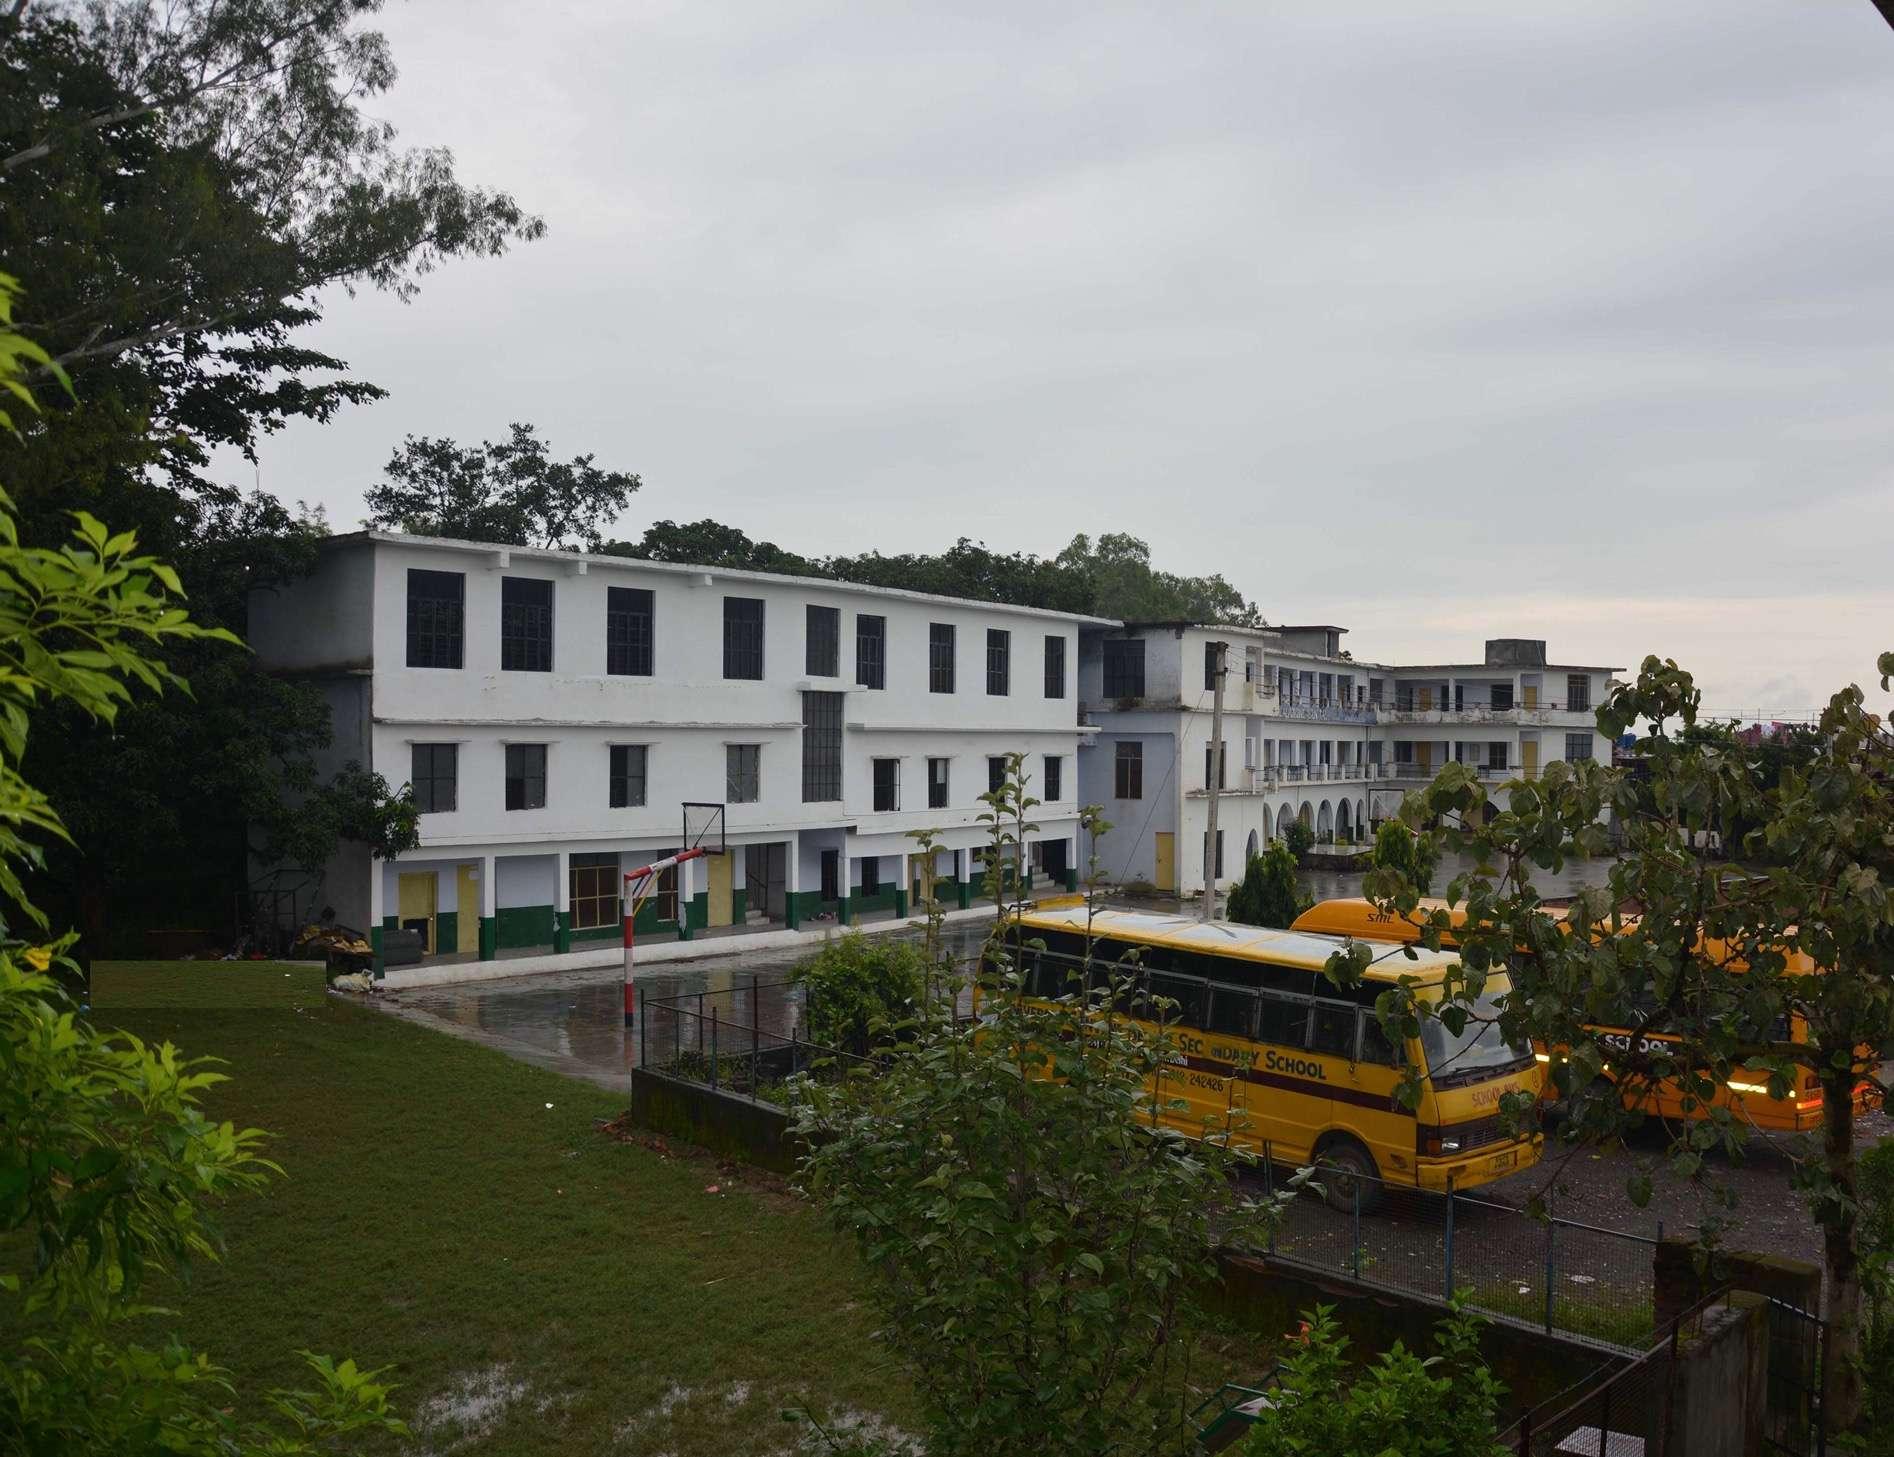 UNIVERSAL CONVENT SCHOOL KALADHUNGI P O KALADHUNGI DISST NAINITAL 3530219